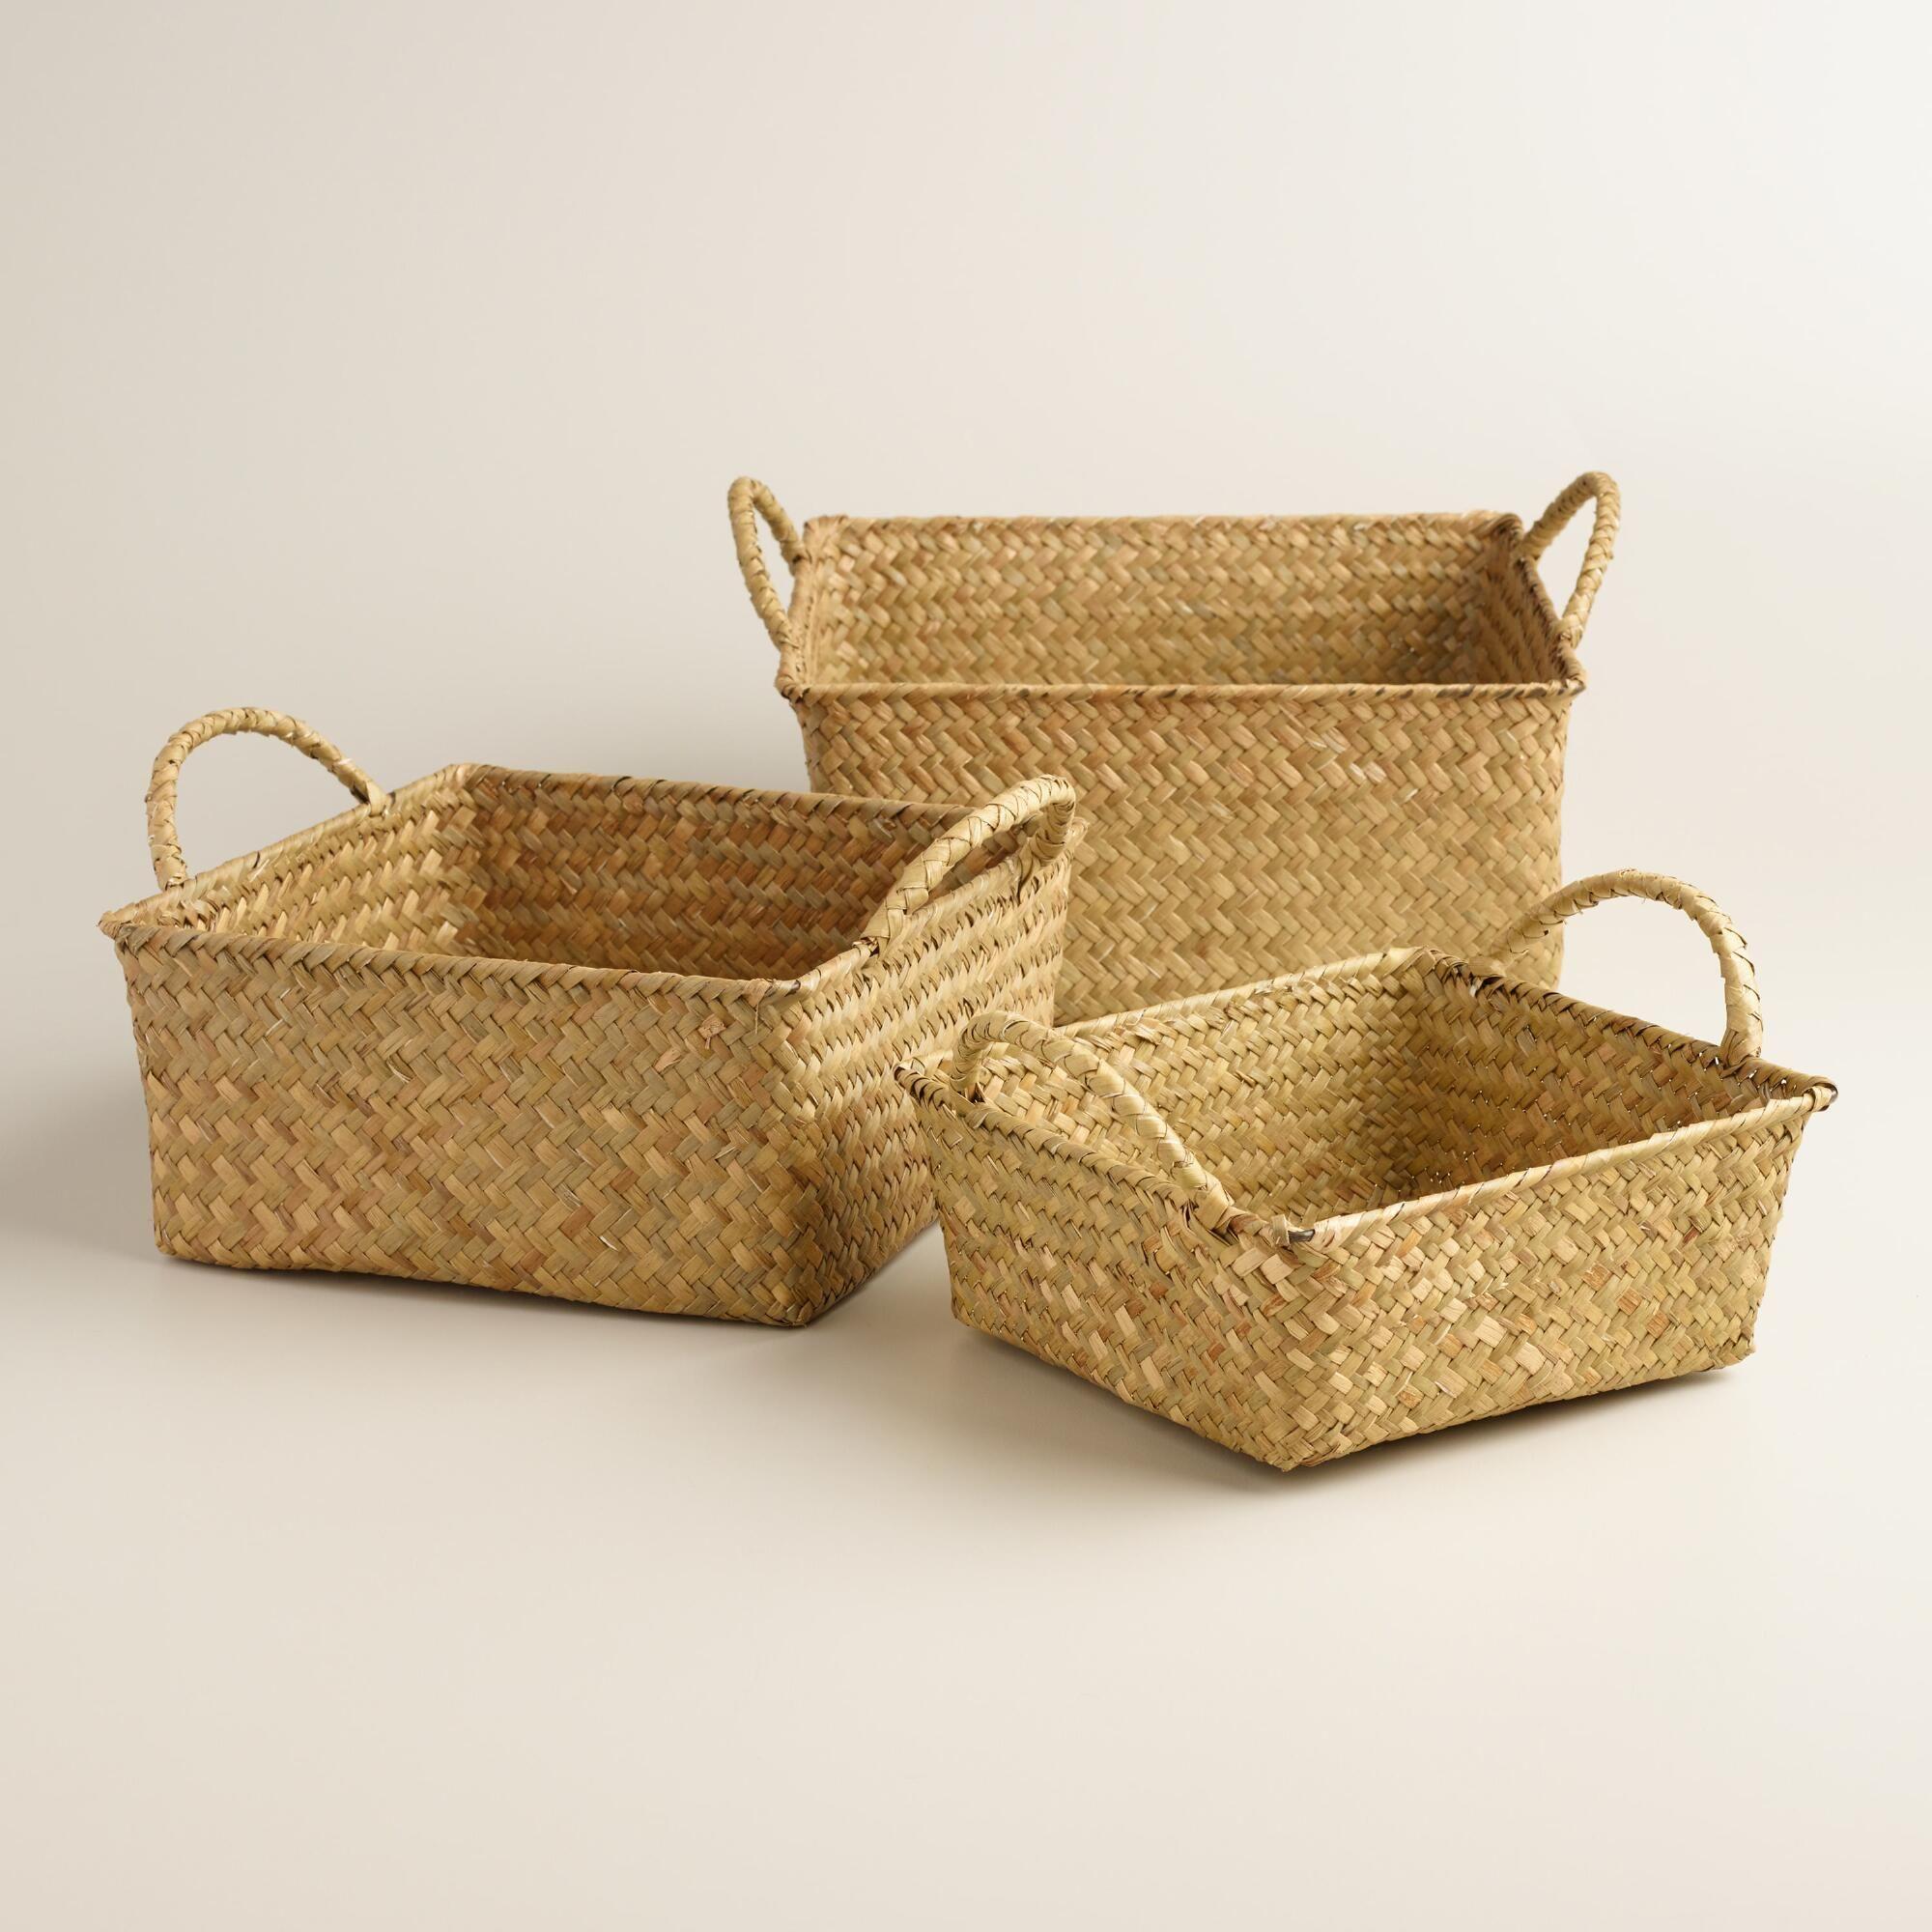 Natural Square Mice Storage Baskets